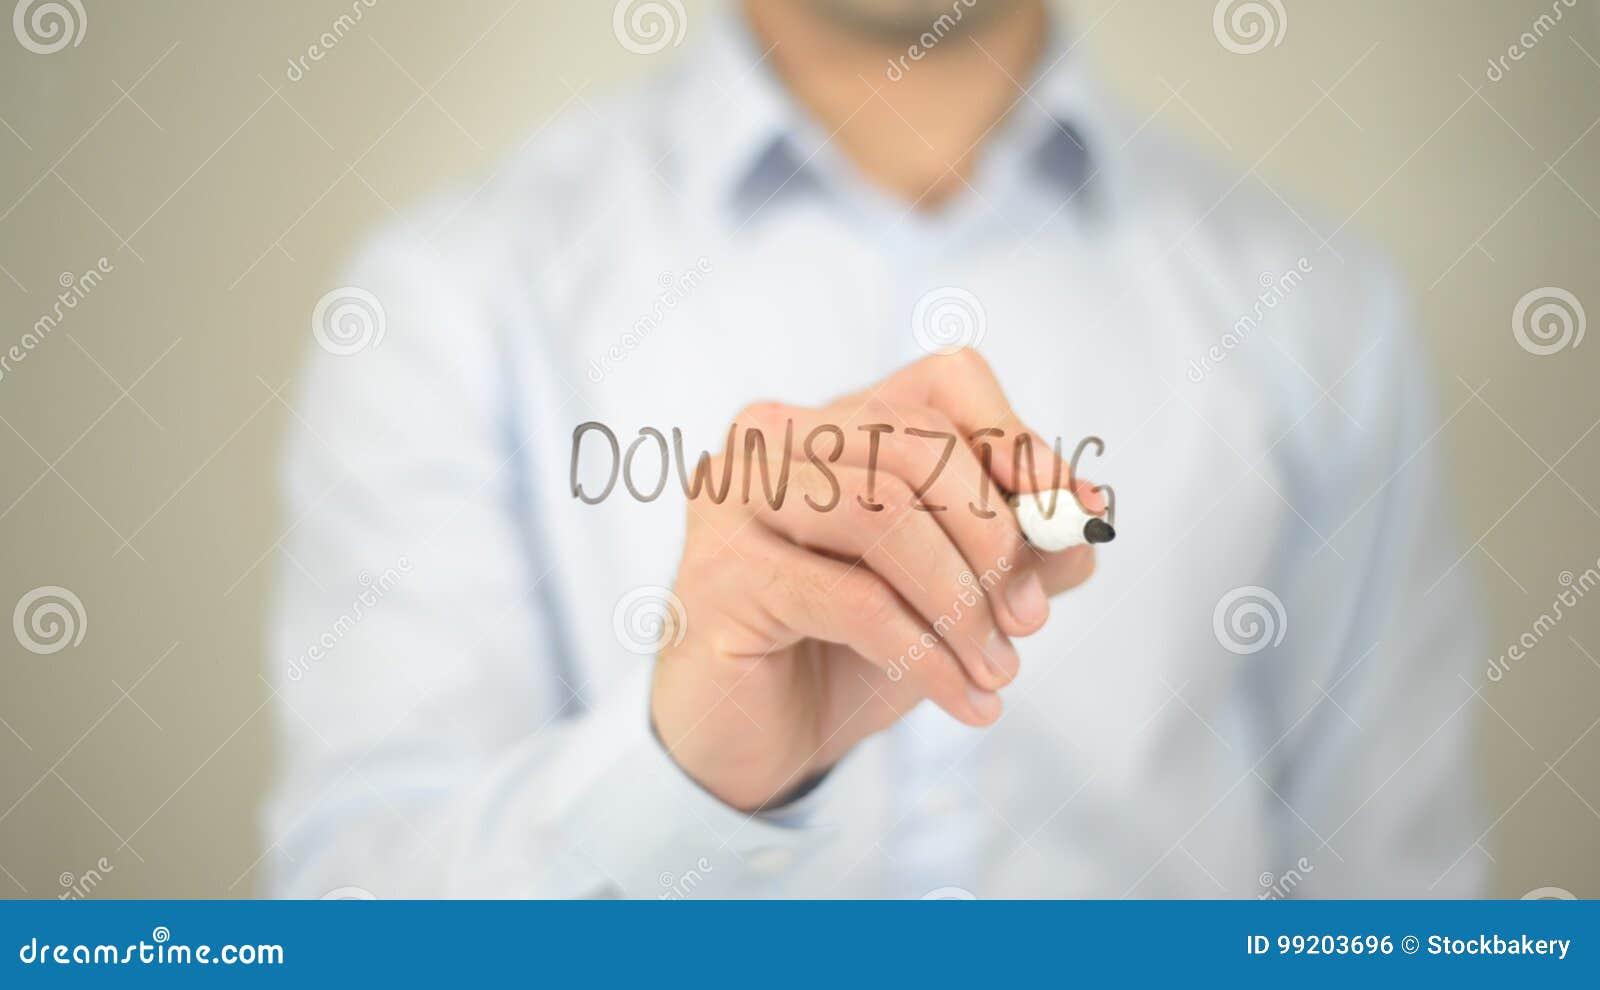 Downsizing , man writing on transparent screen